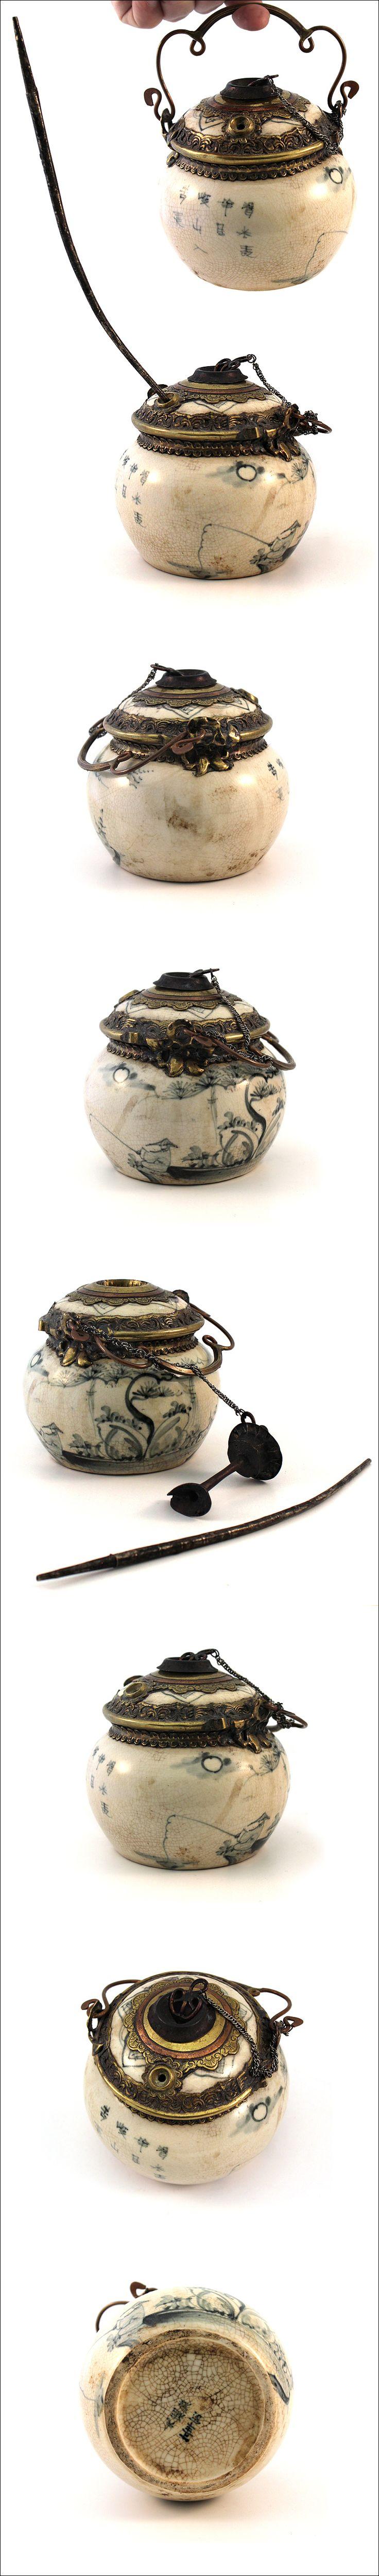 Ceramic Opium Pipe, Yunnan, South China